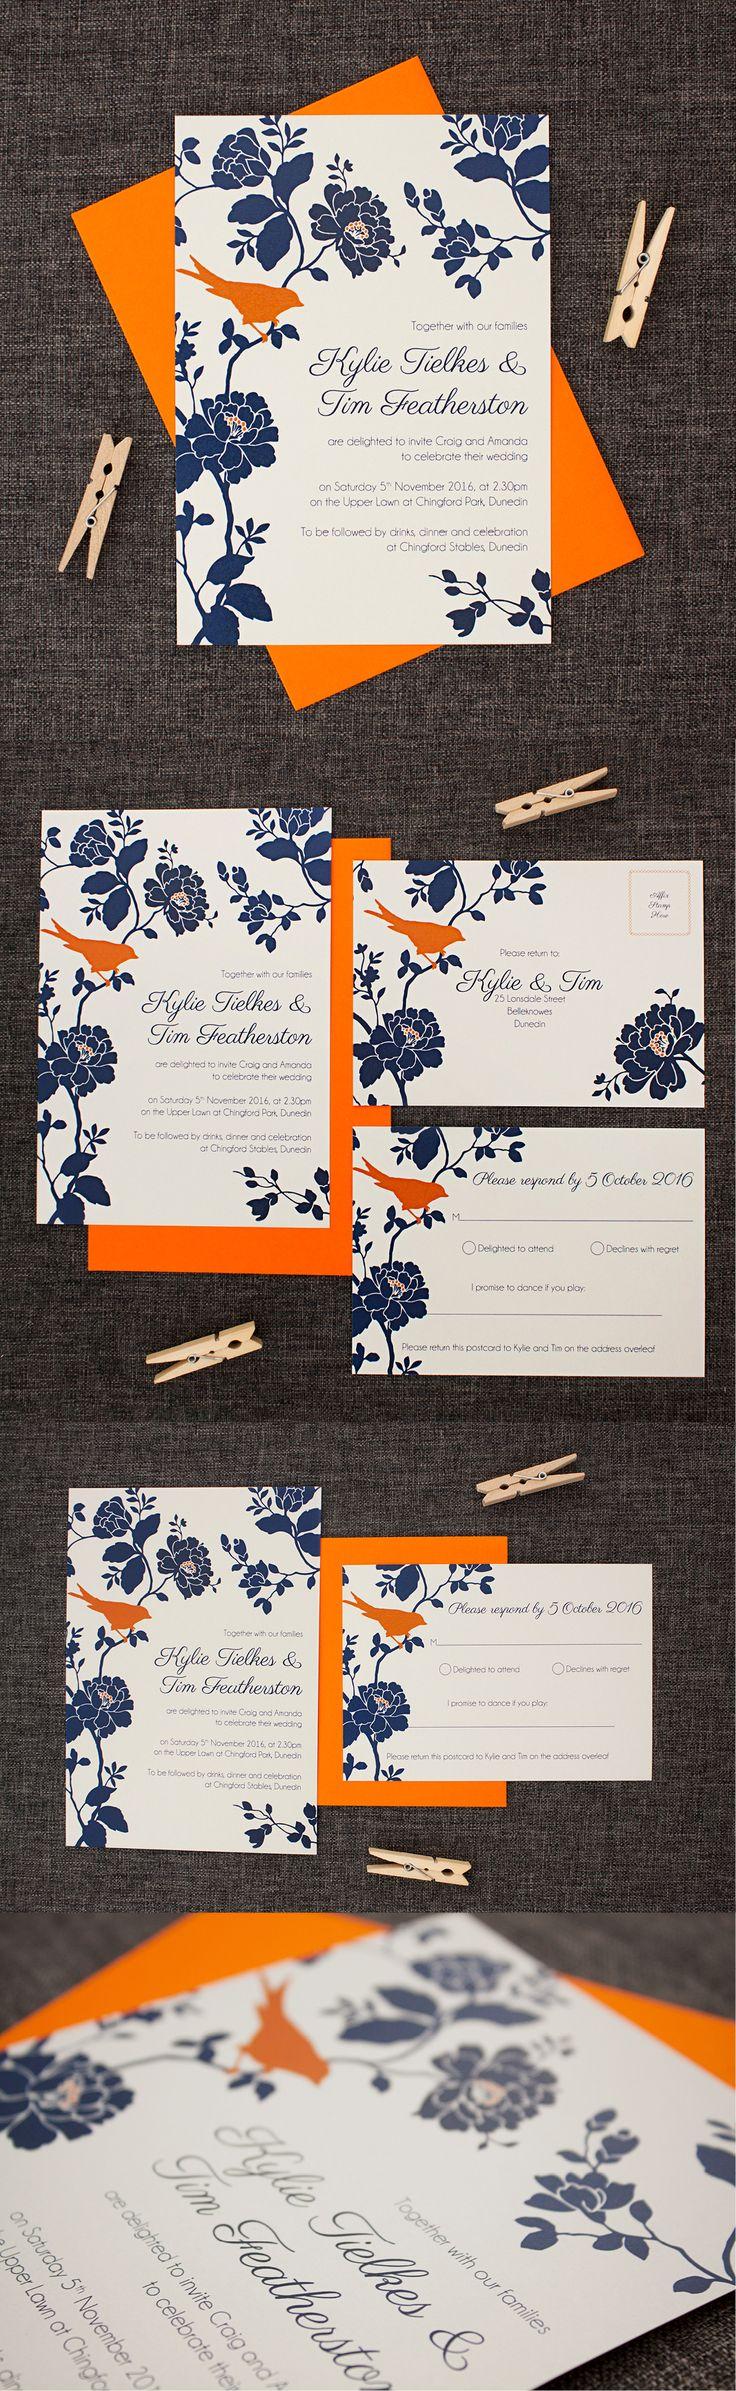 grey orange and navy blue wedding invitations